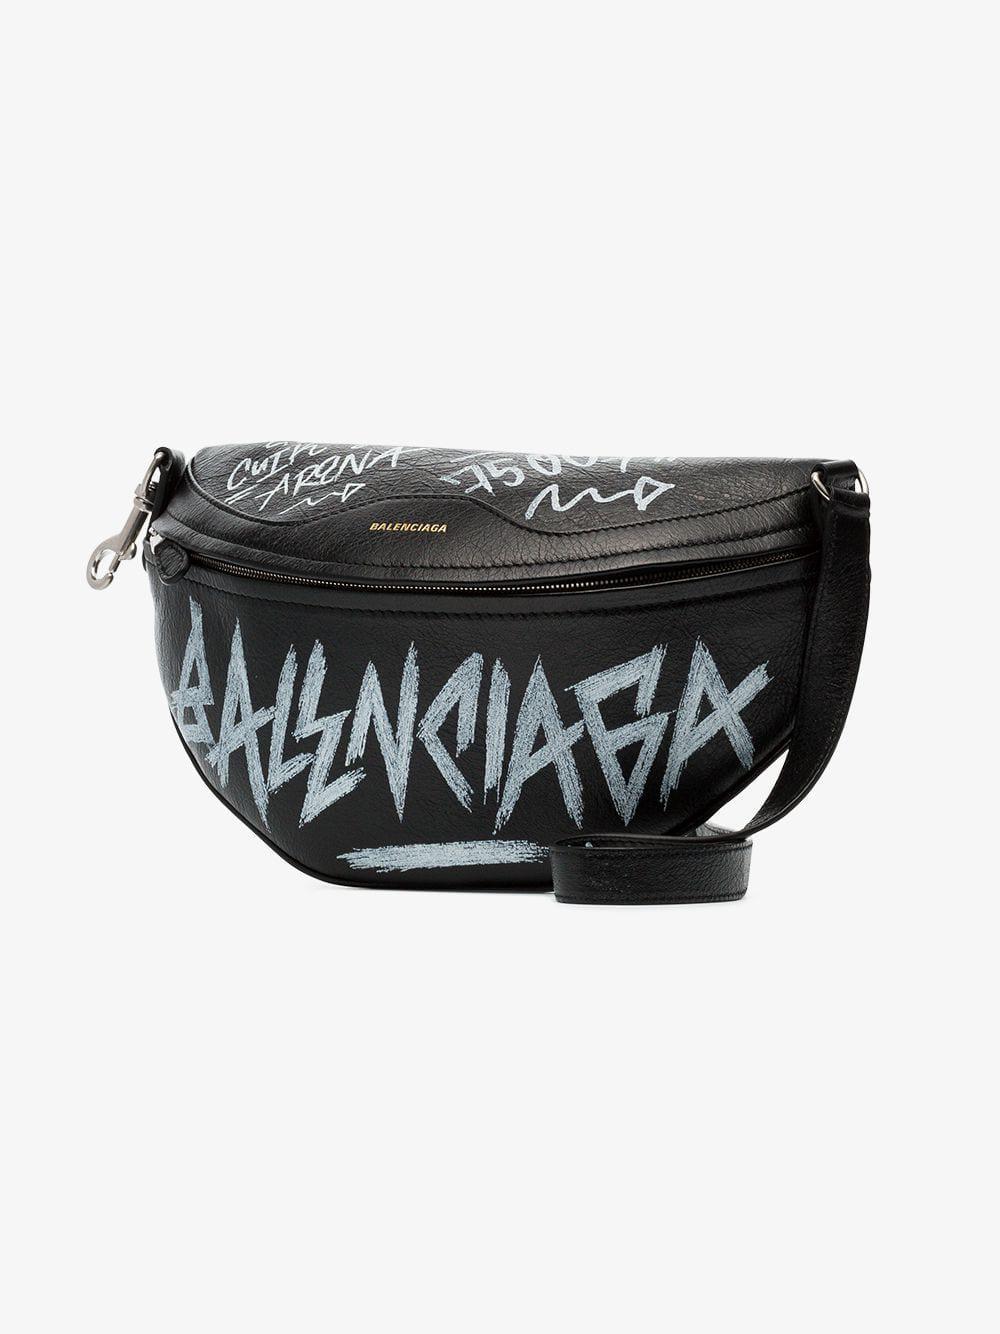 Lyst - Balenciaga Black And White Souvenir Xs Graffiti Leather Belt ... ad2cb1a6e7ddd